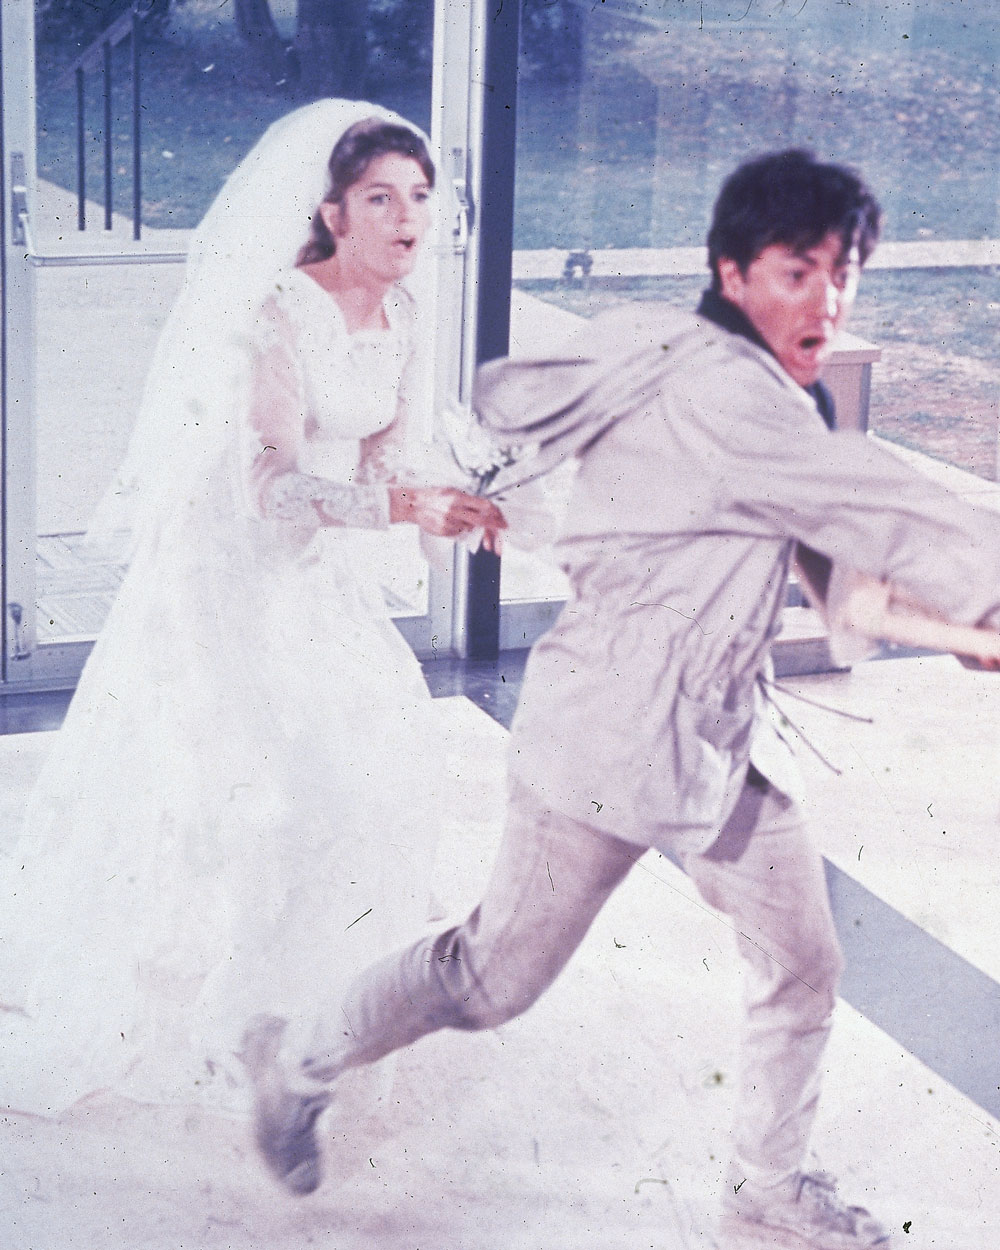 The Graduate Wedding Scene